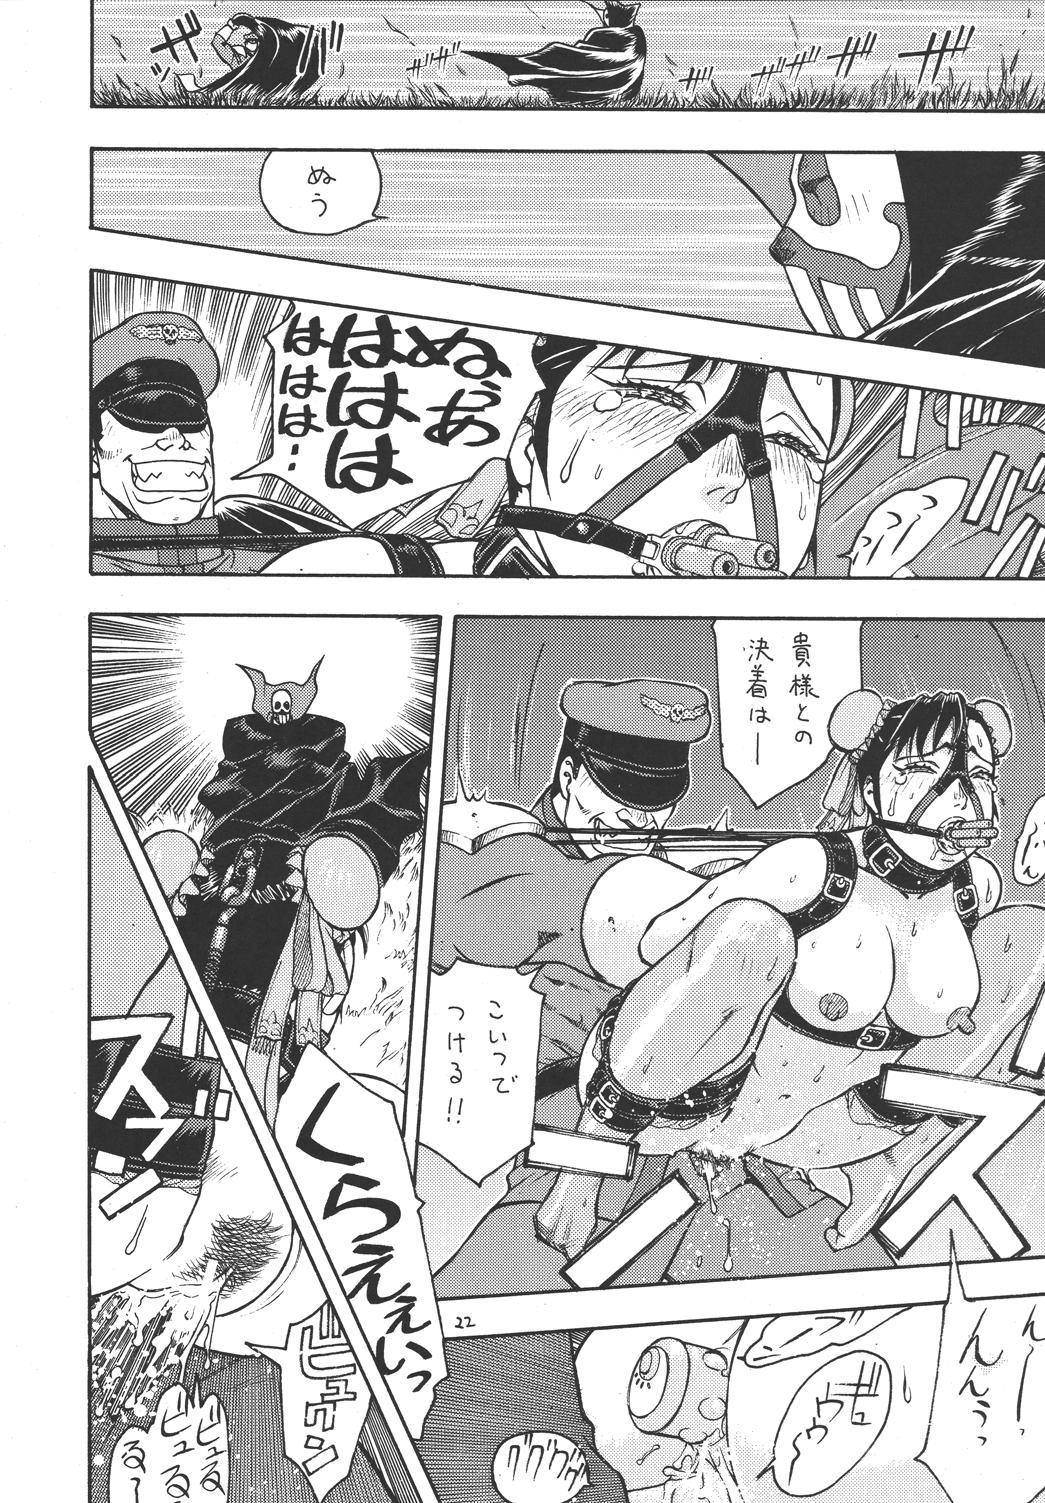 Fighters Giga Comics Round 1 20